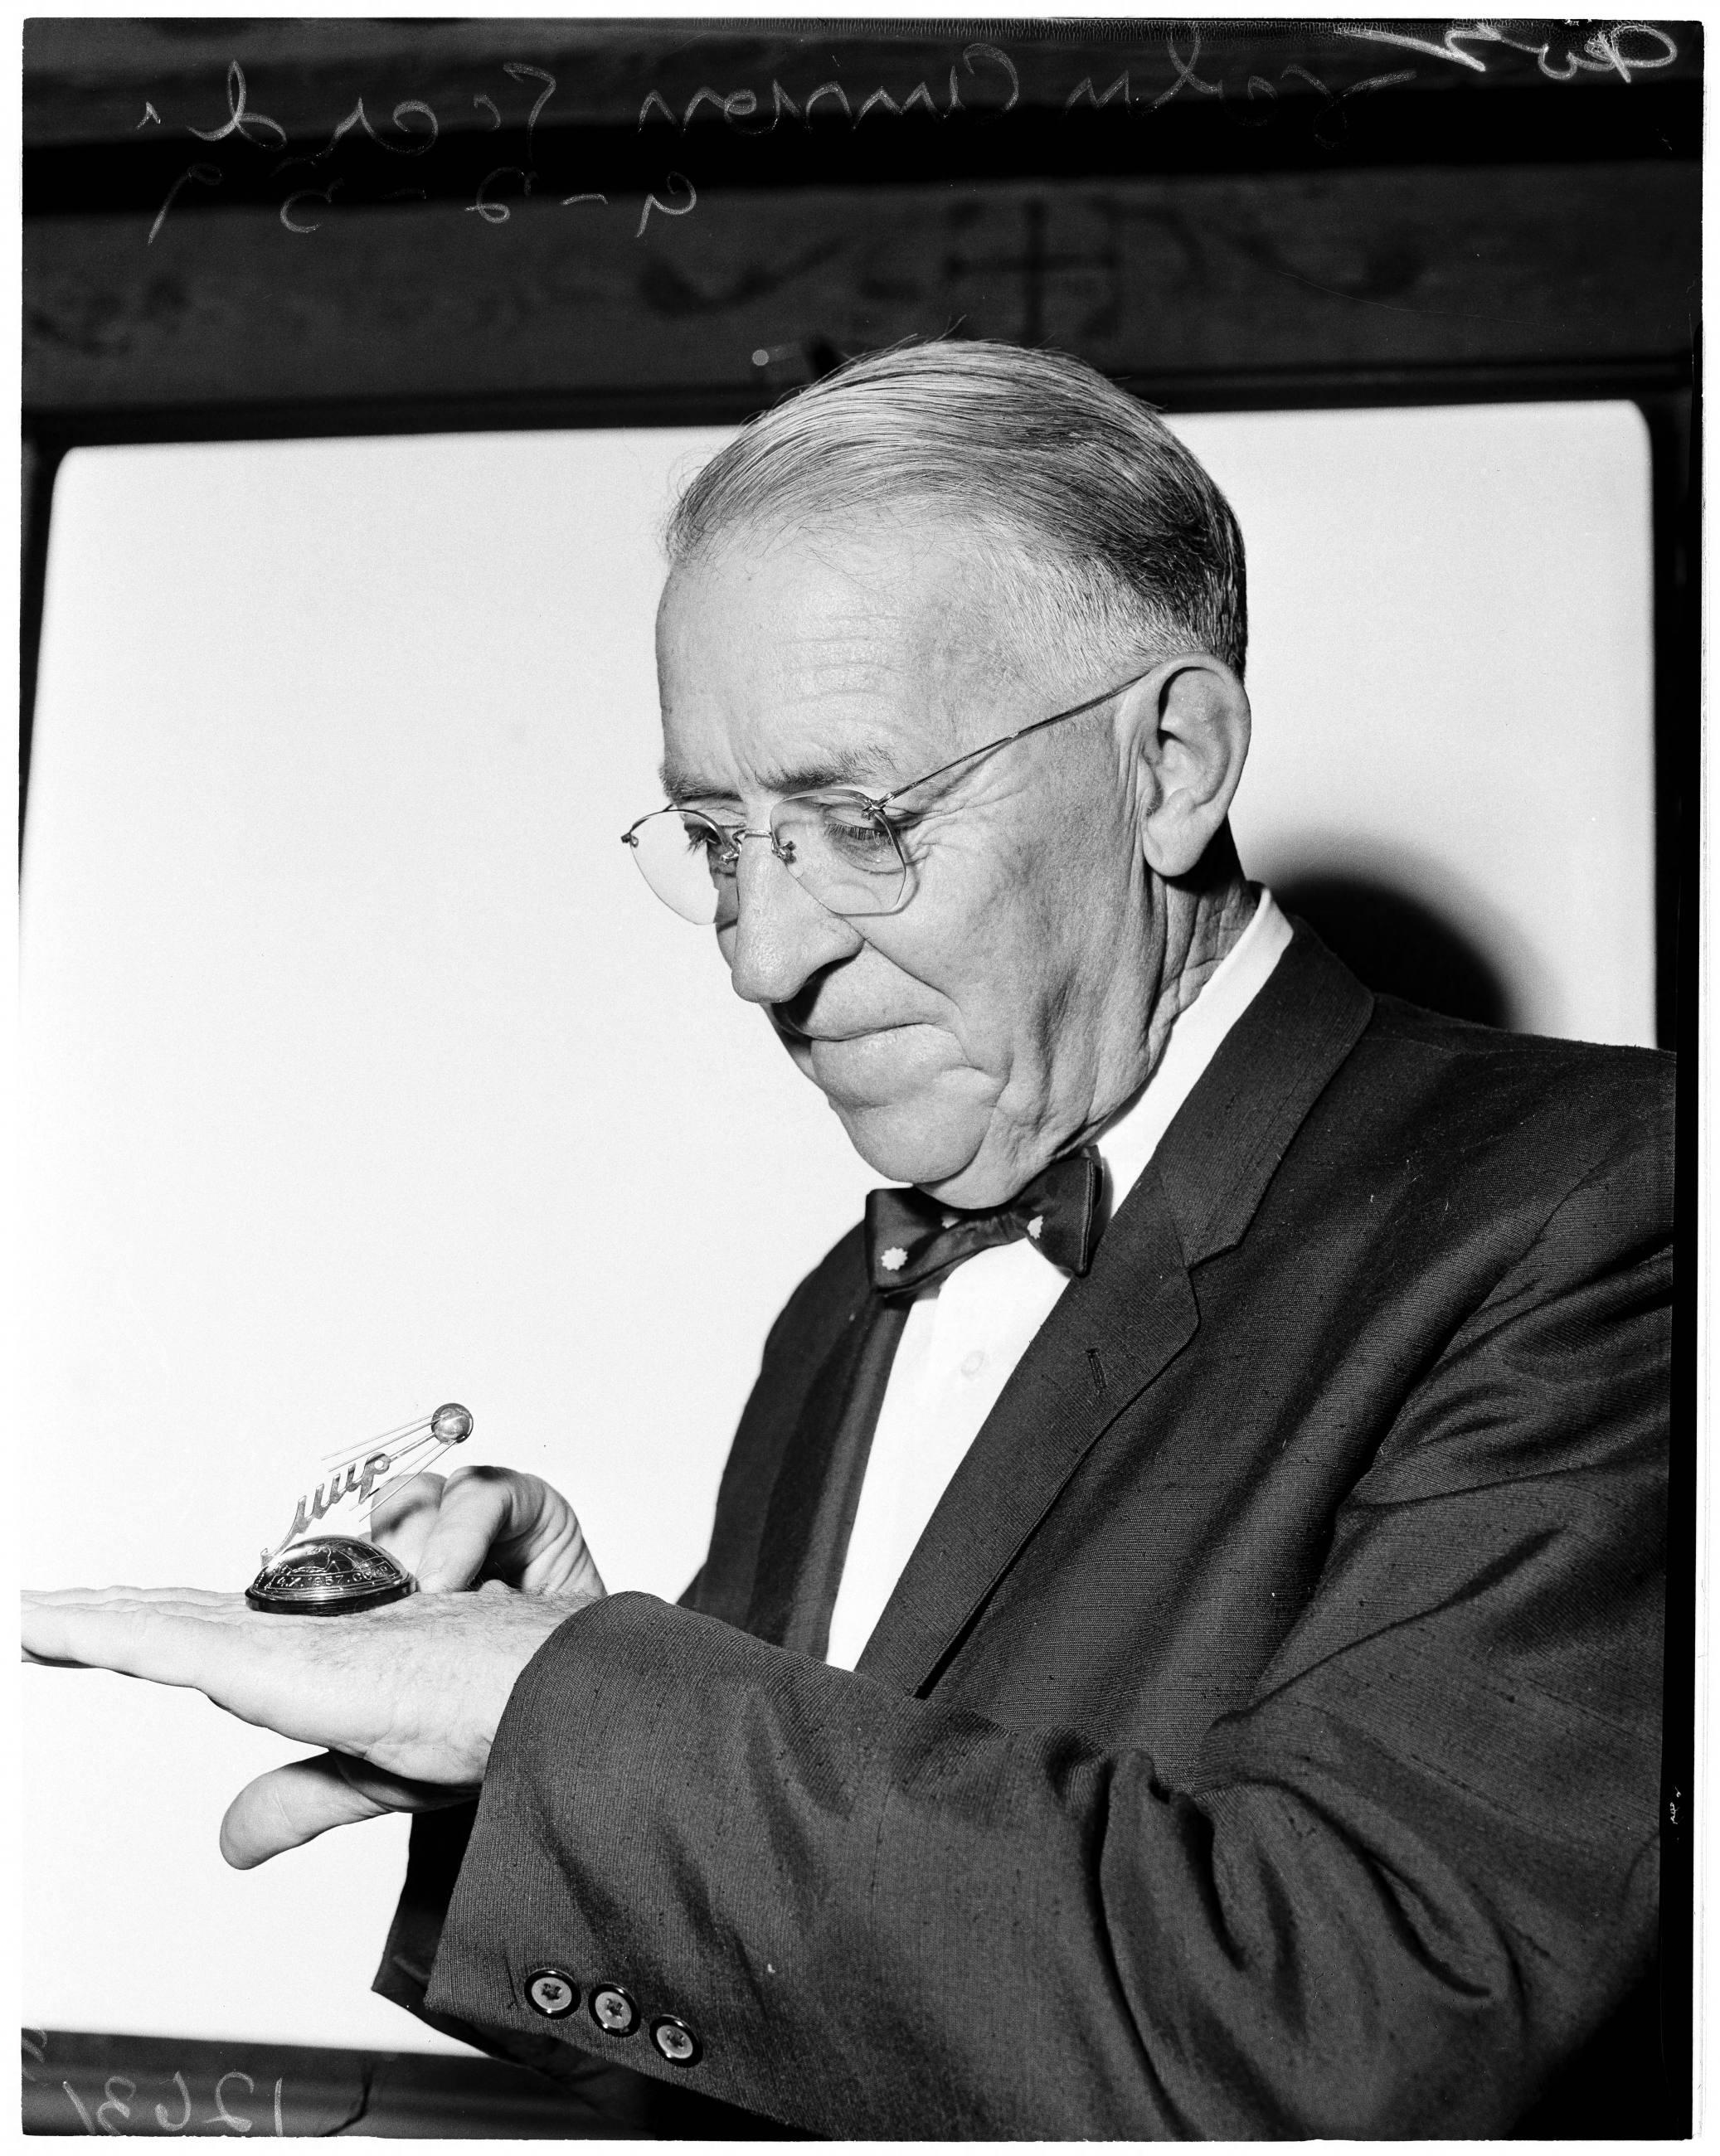 John Anson Ford in 1959